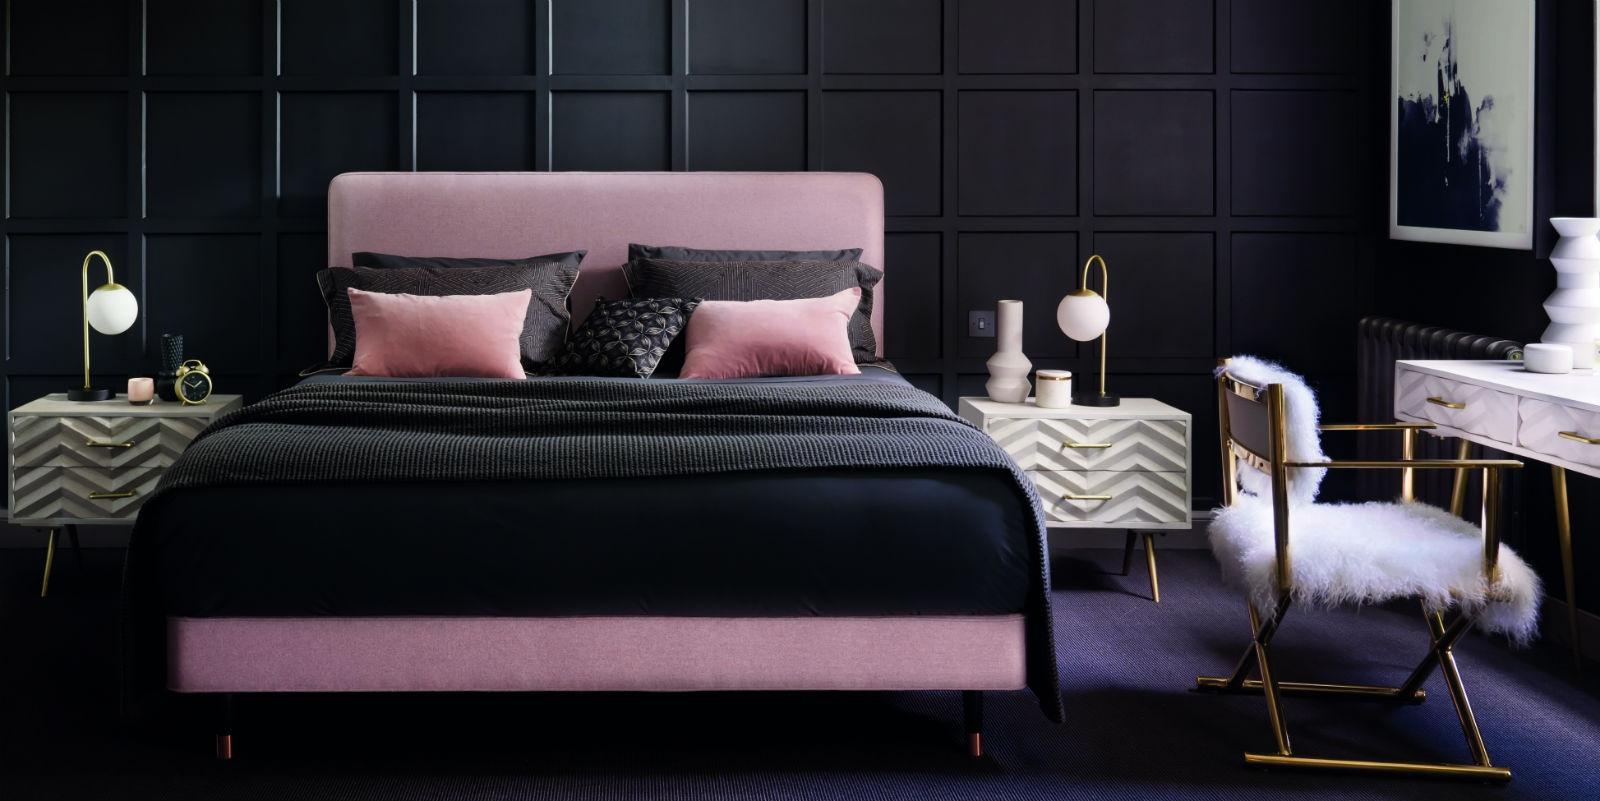 Design your Bespoke Bed